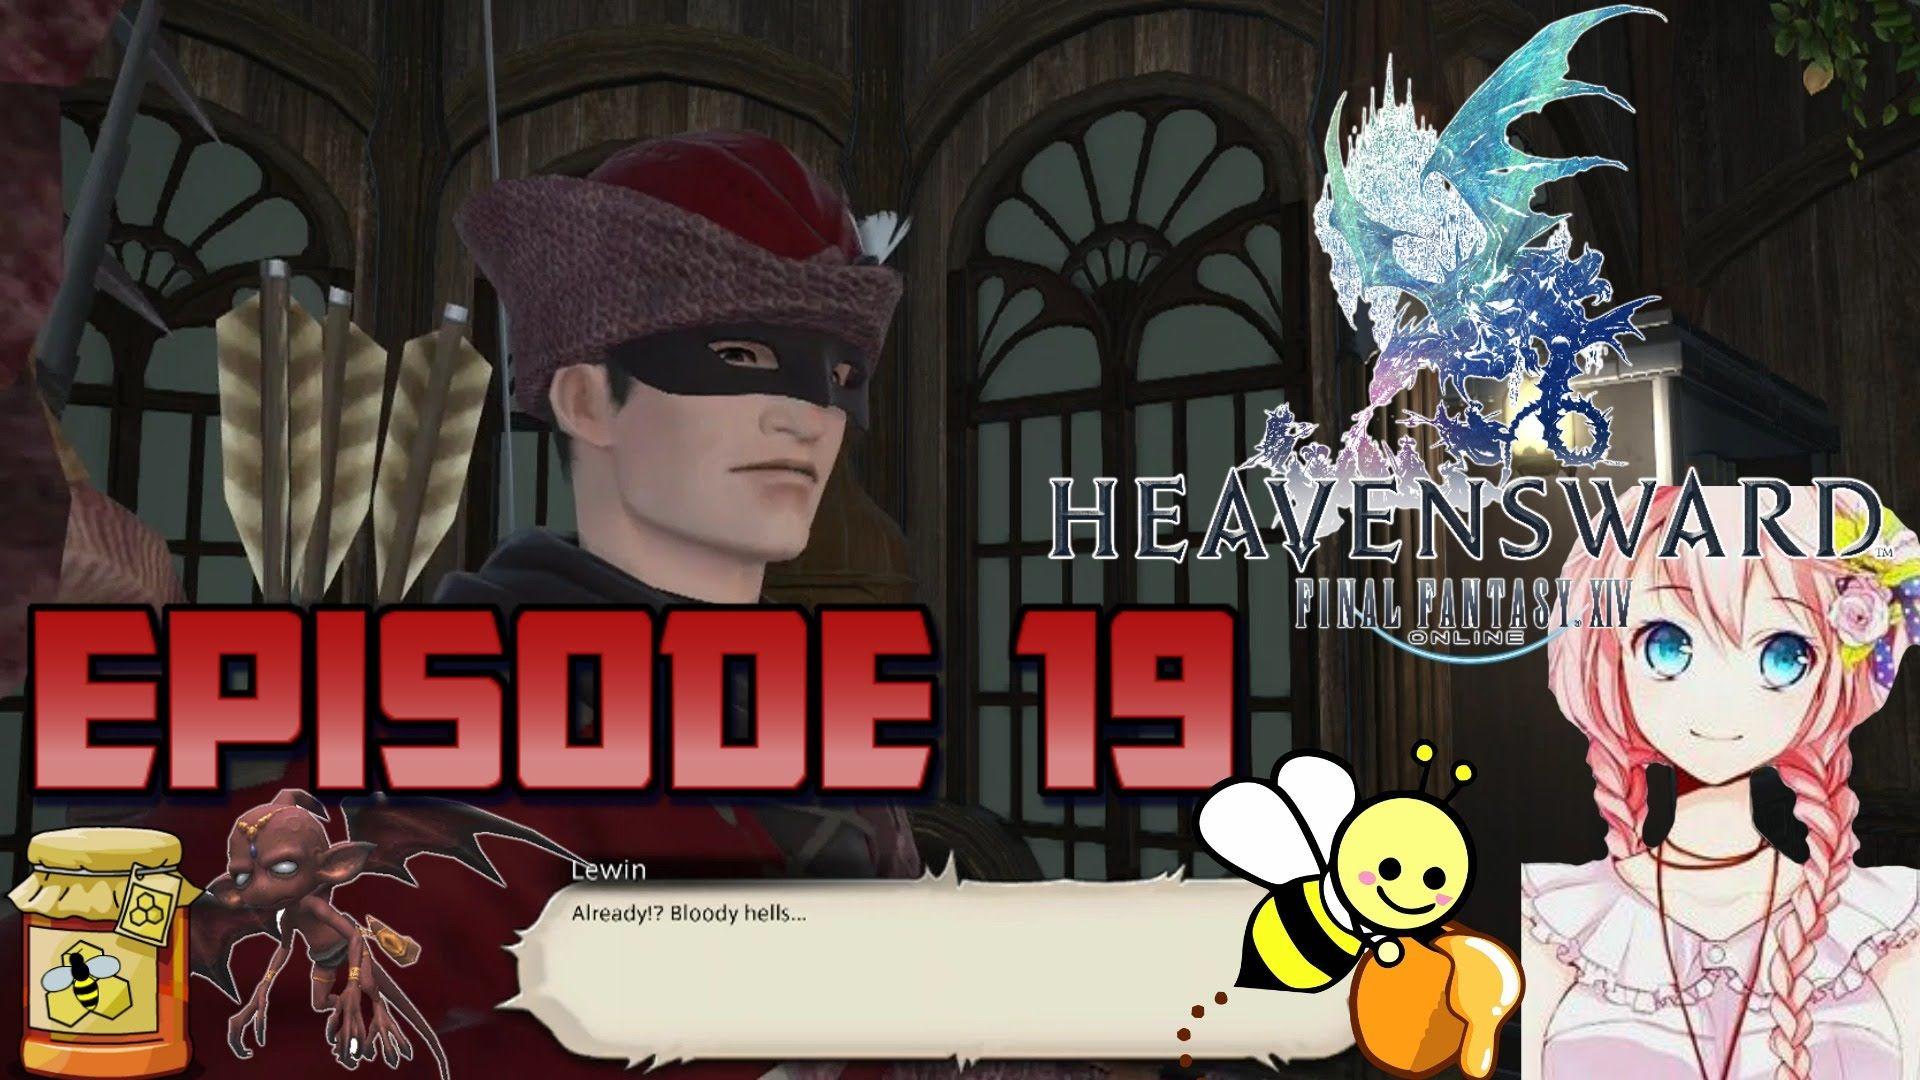 Protect the precious honey! Final fantasy 14 Heavensward